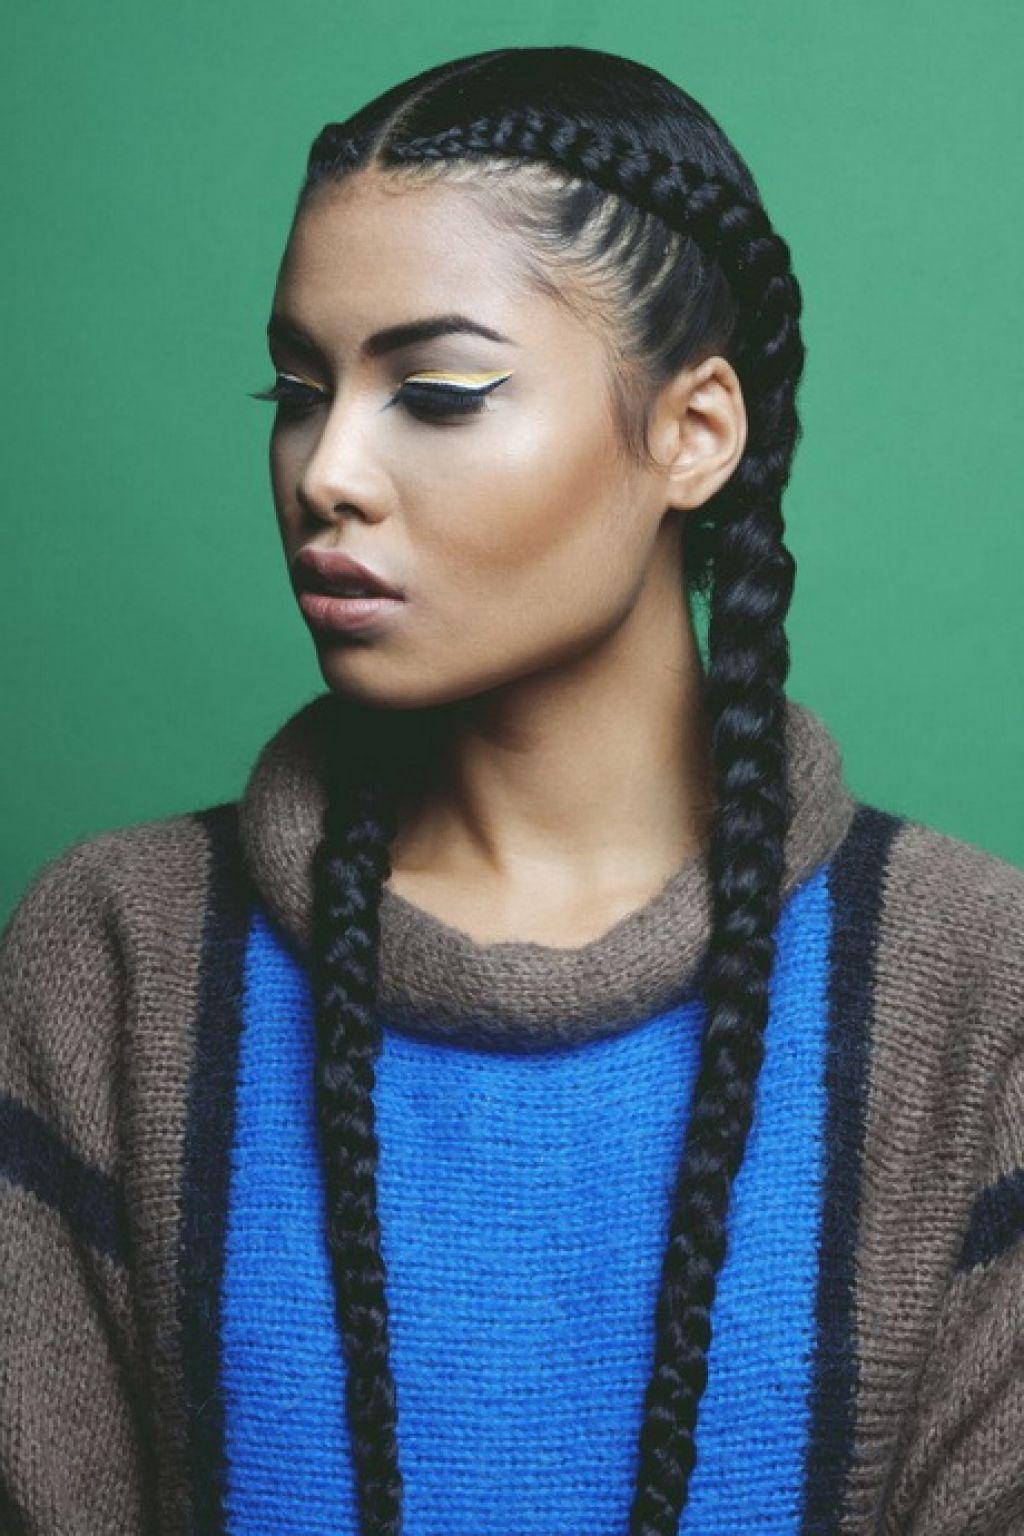 Afrikanische Box Zopfe Frisuren Fur Frauen Brautfrisuren Haar